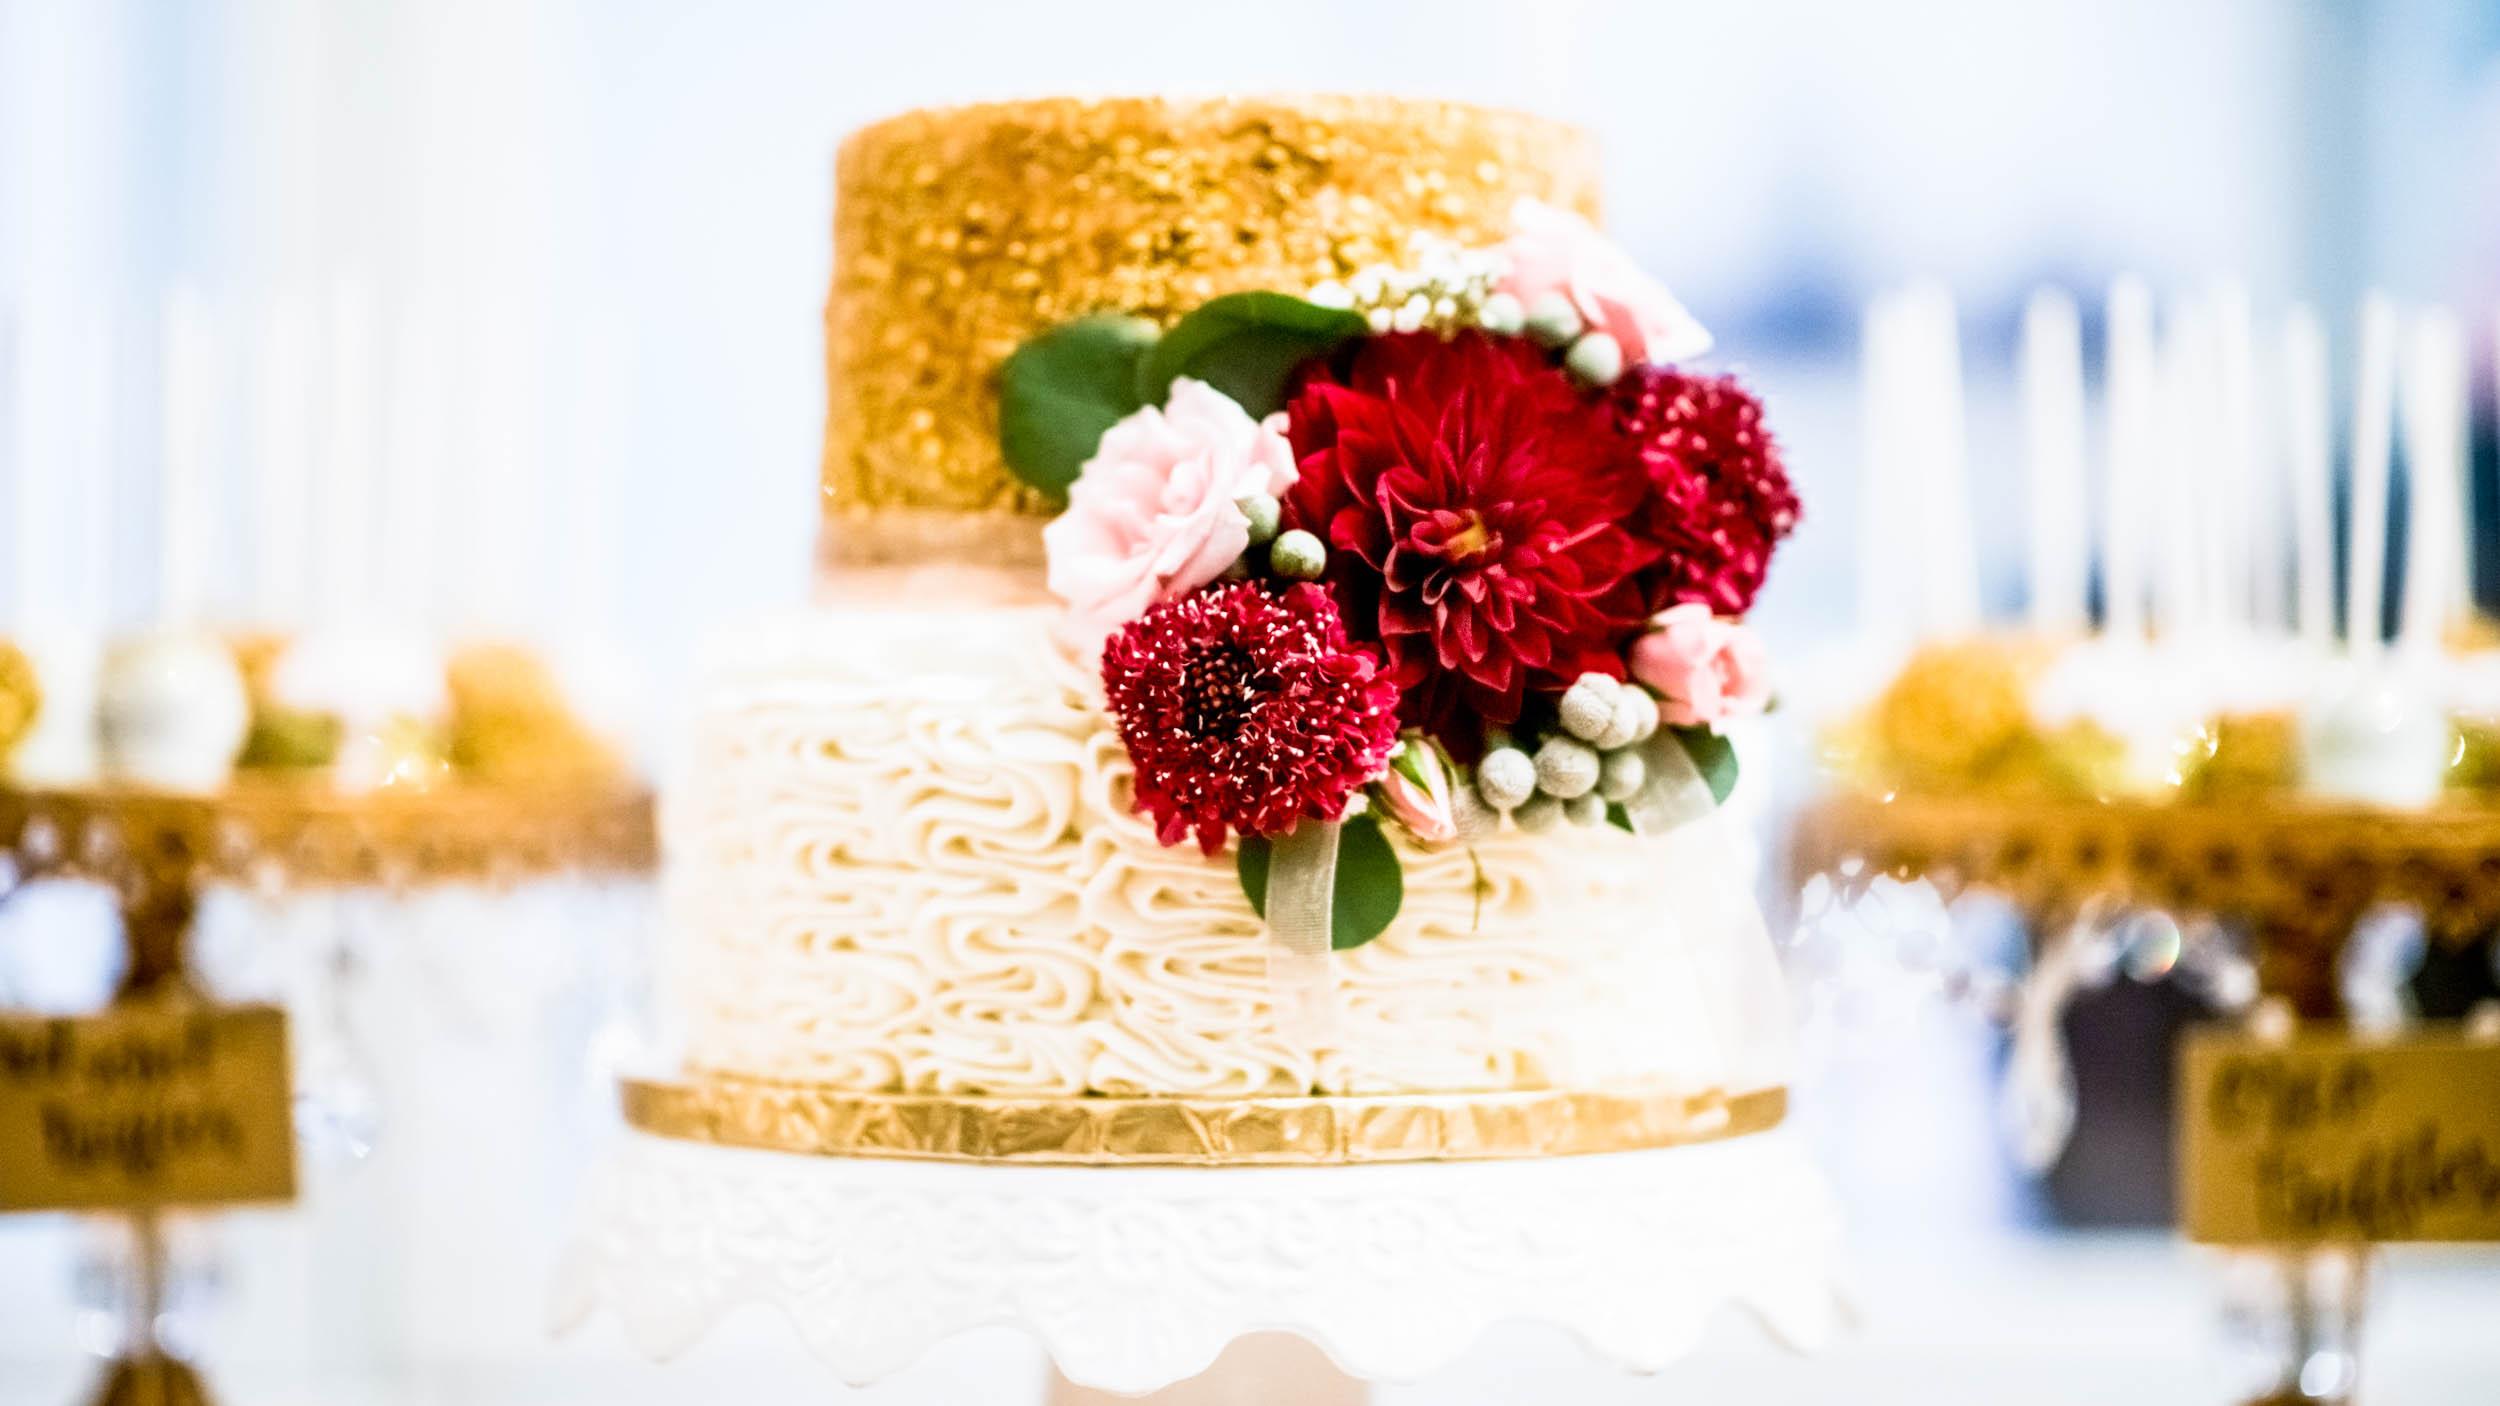 dc+metro+wedding+photographer+vadym+guliuk+photography+wedding+cake-2025.jpg